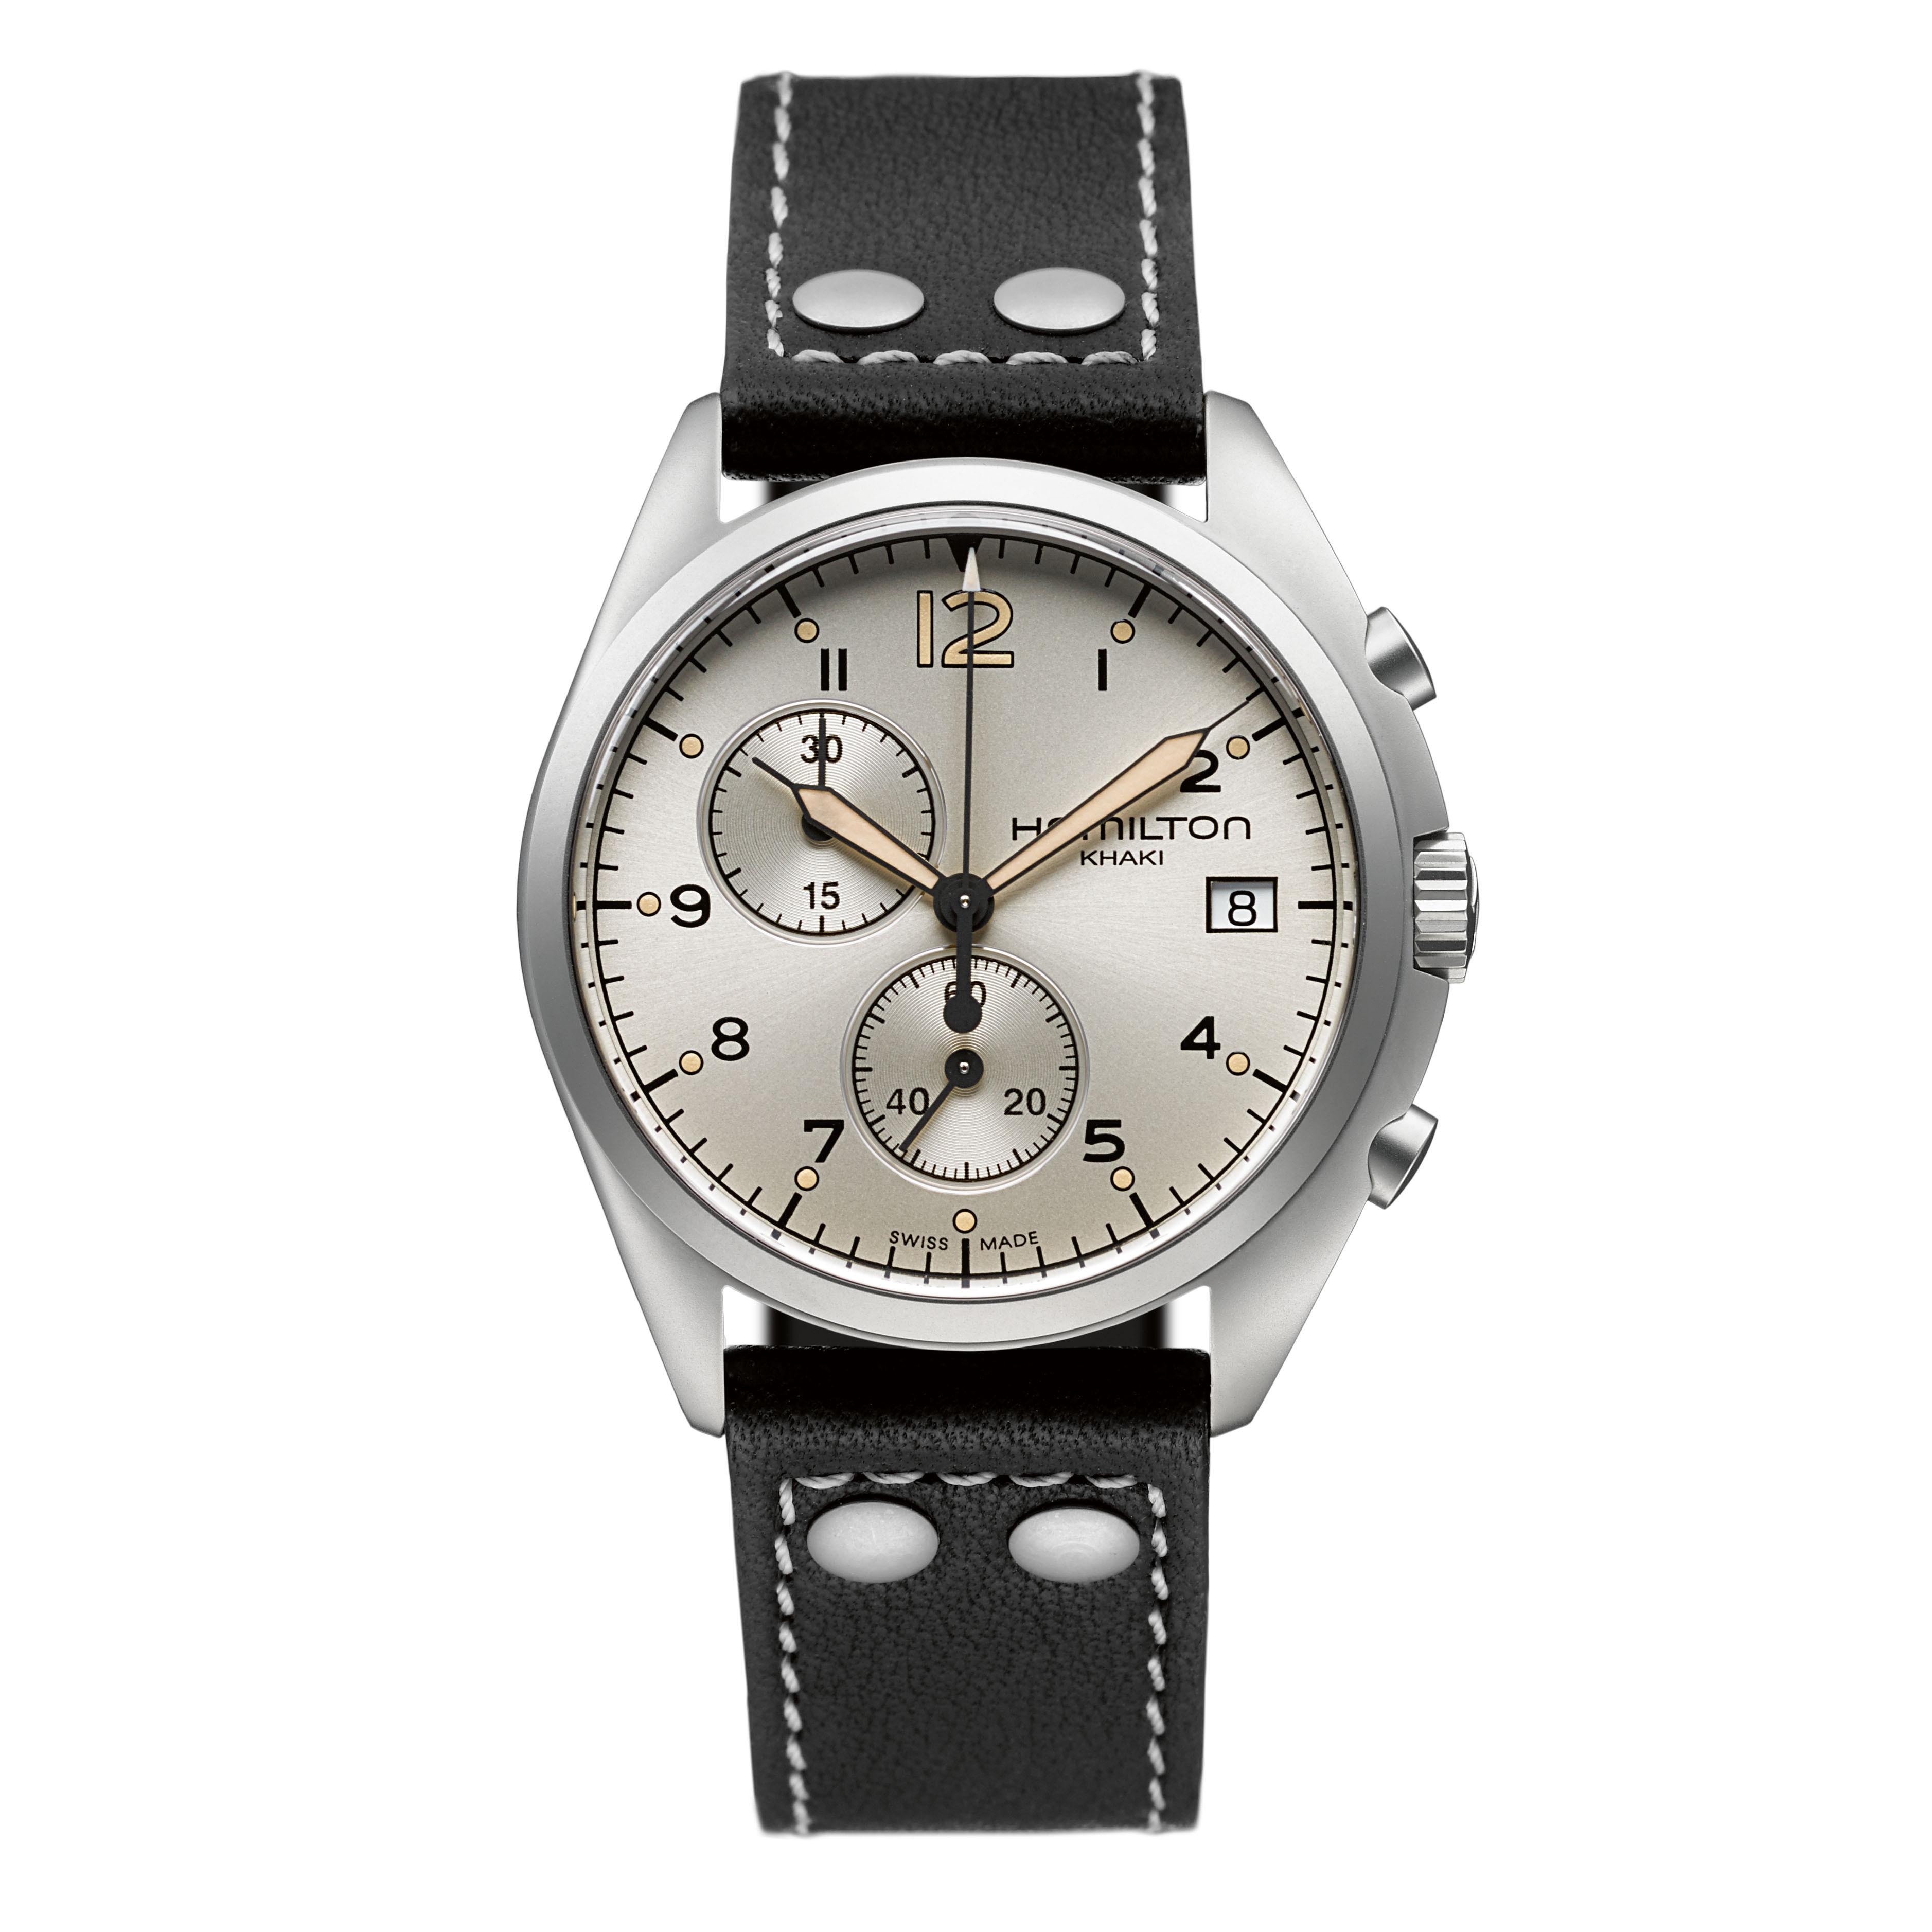 Hamilton Khaki Pilot Chronograph.